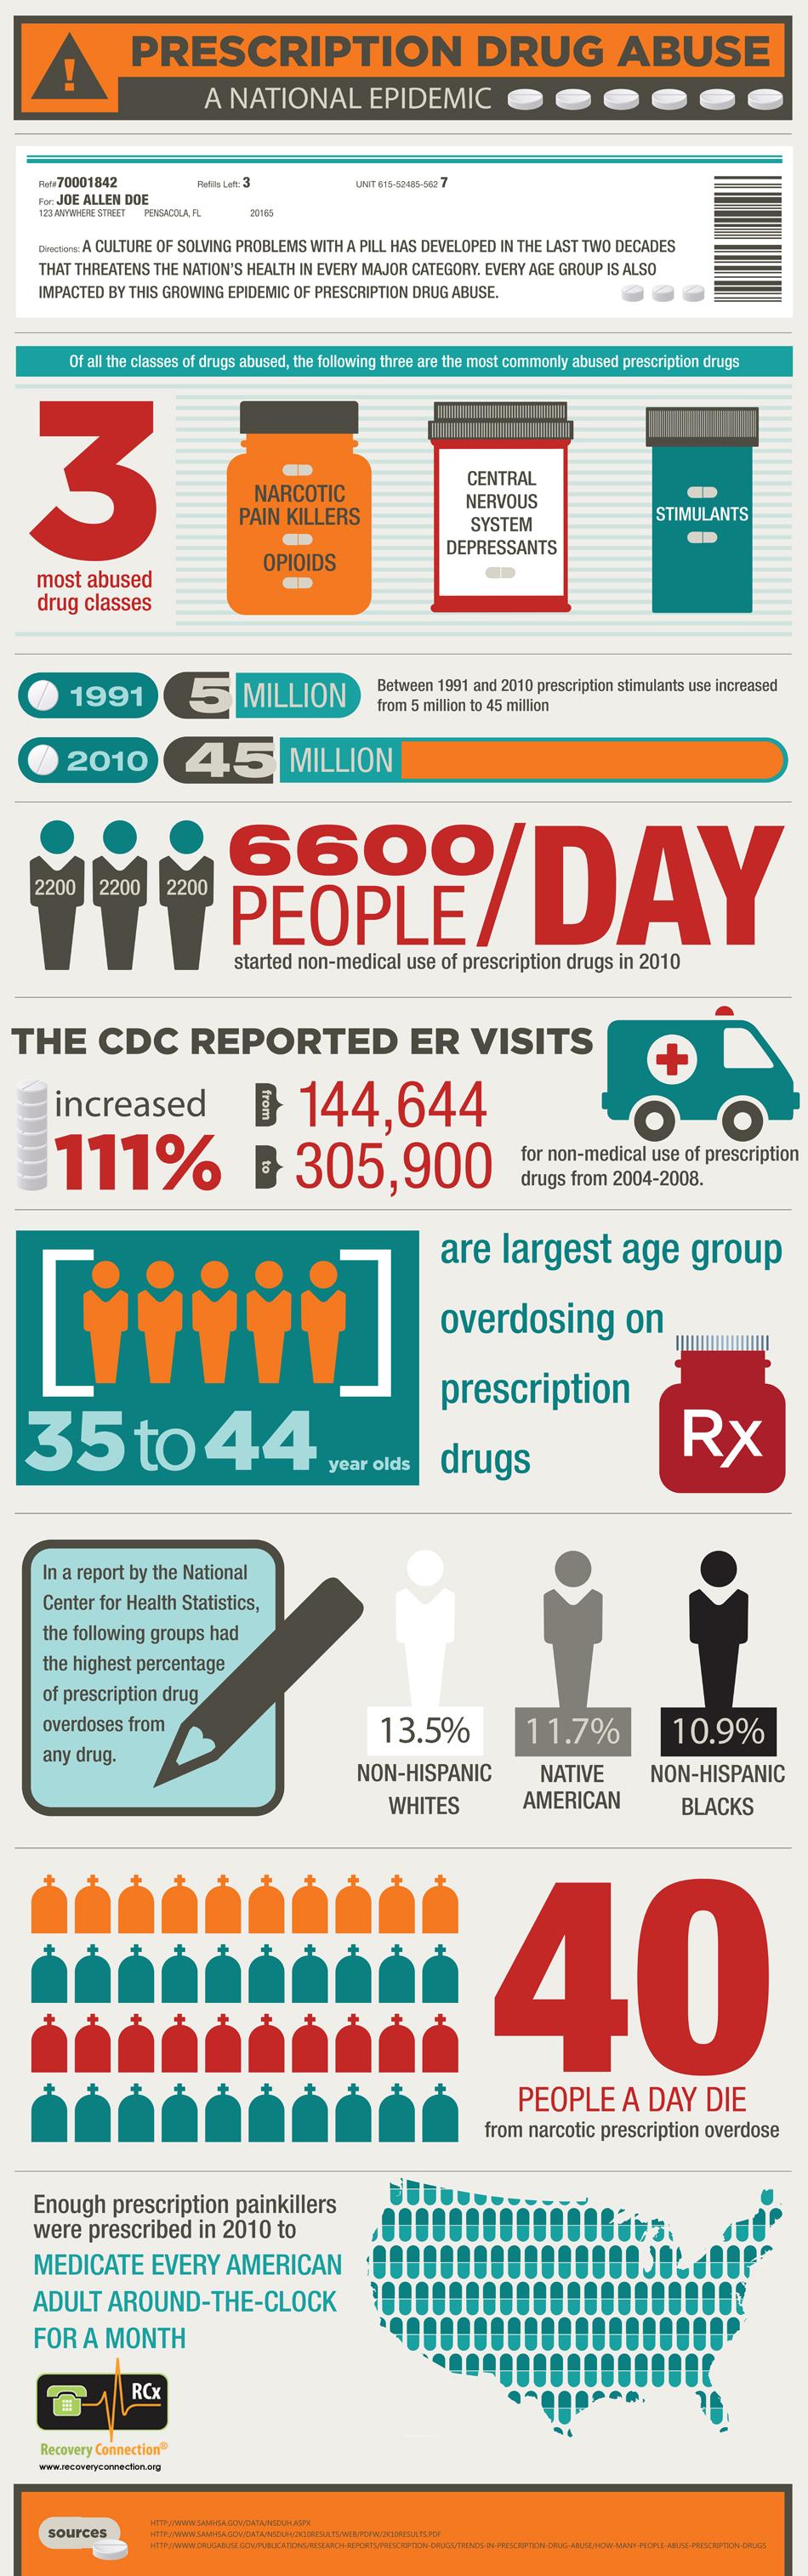 Prescription drug abuse: a national epidemic